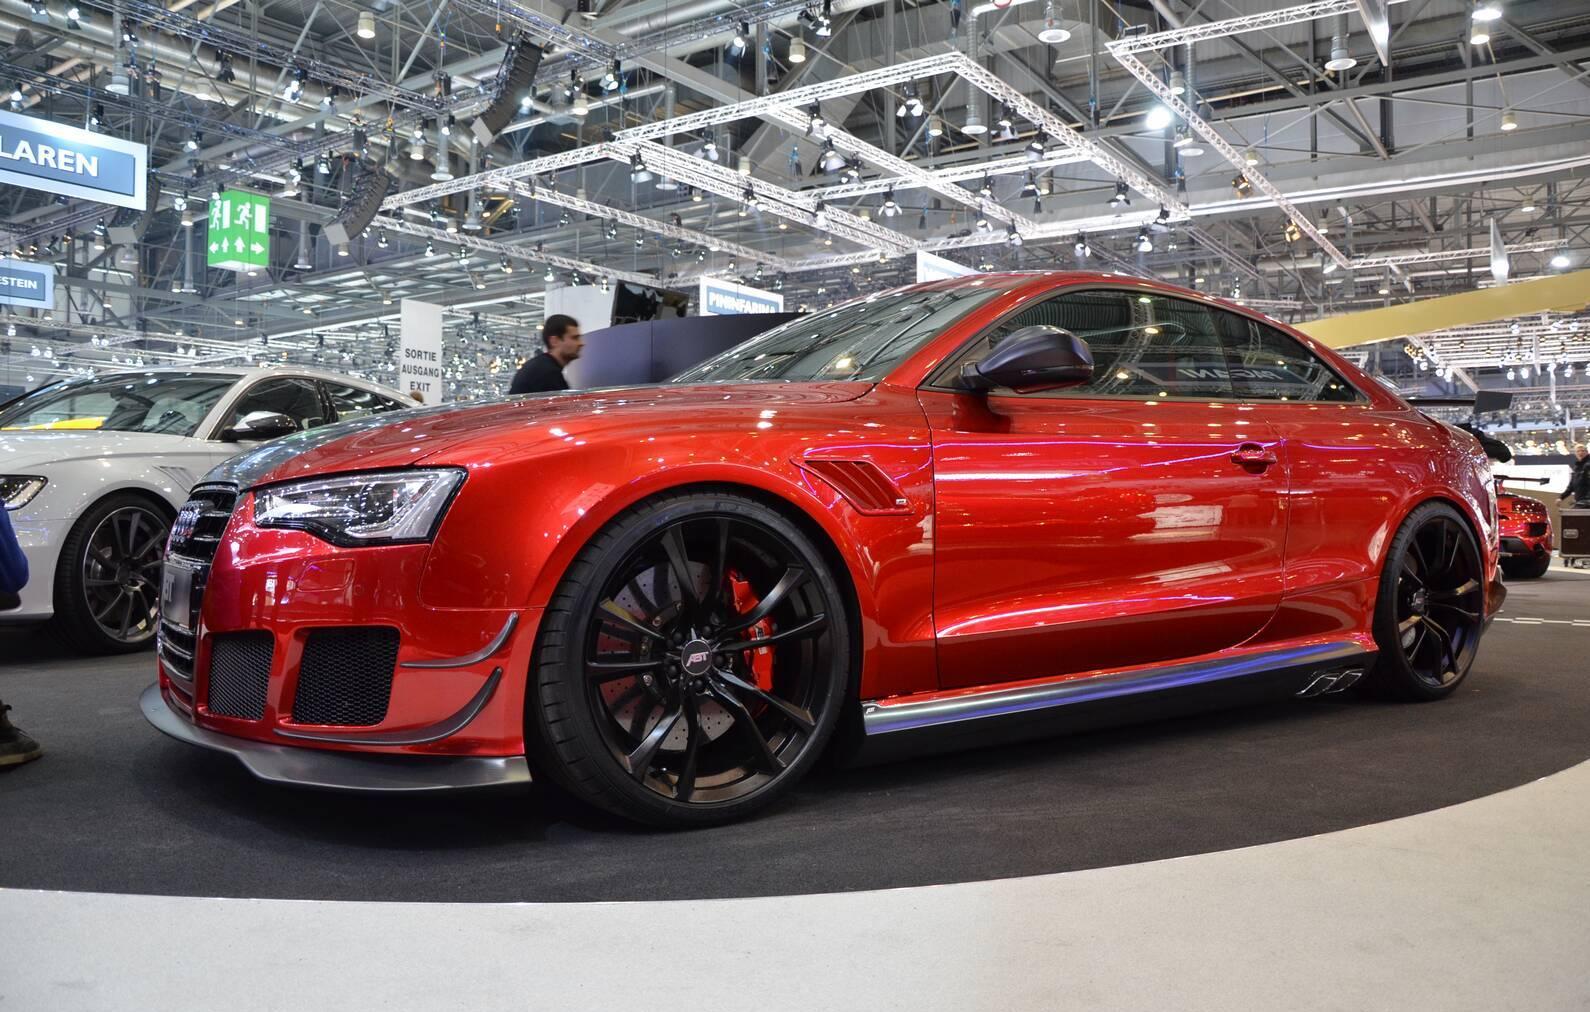 2015 Abt Rs5 R Based On Audi Rs5 Black Front Wallpaper 1